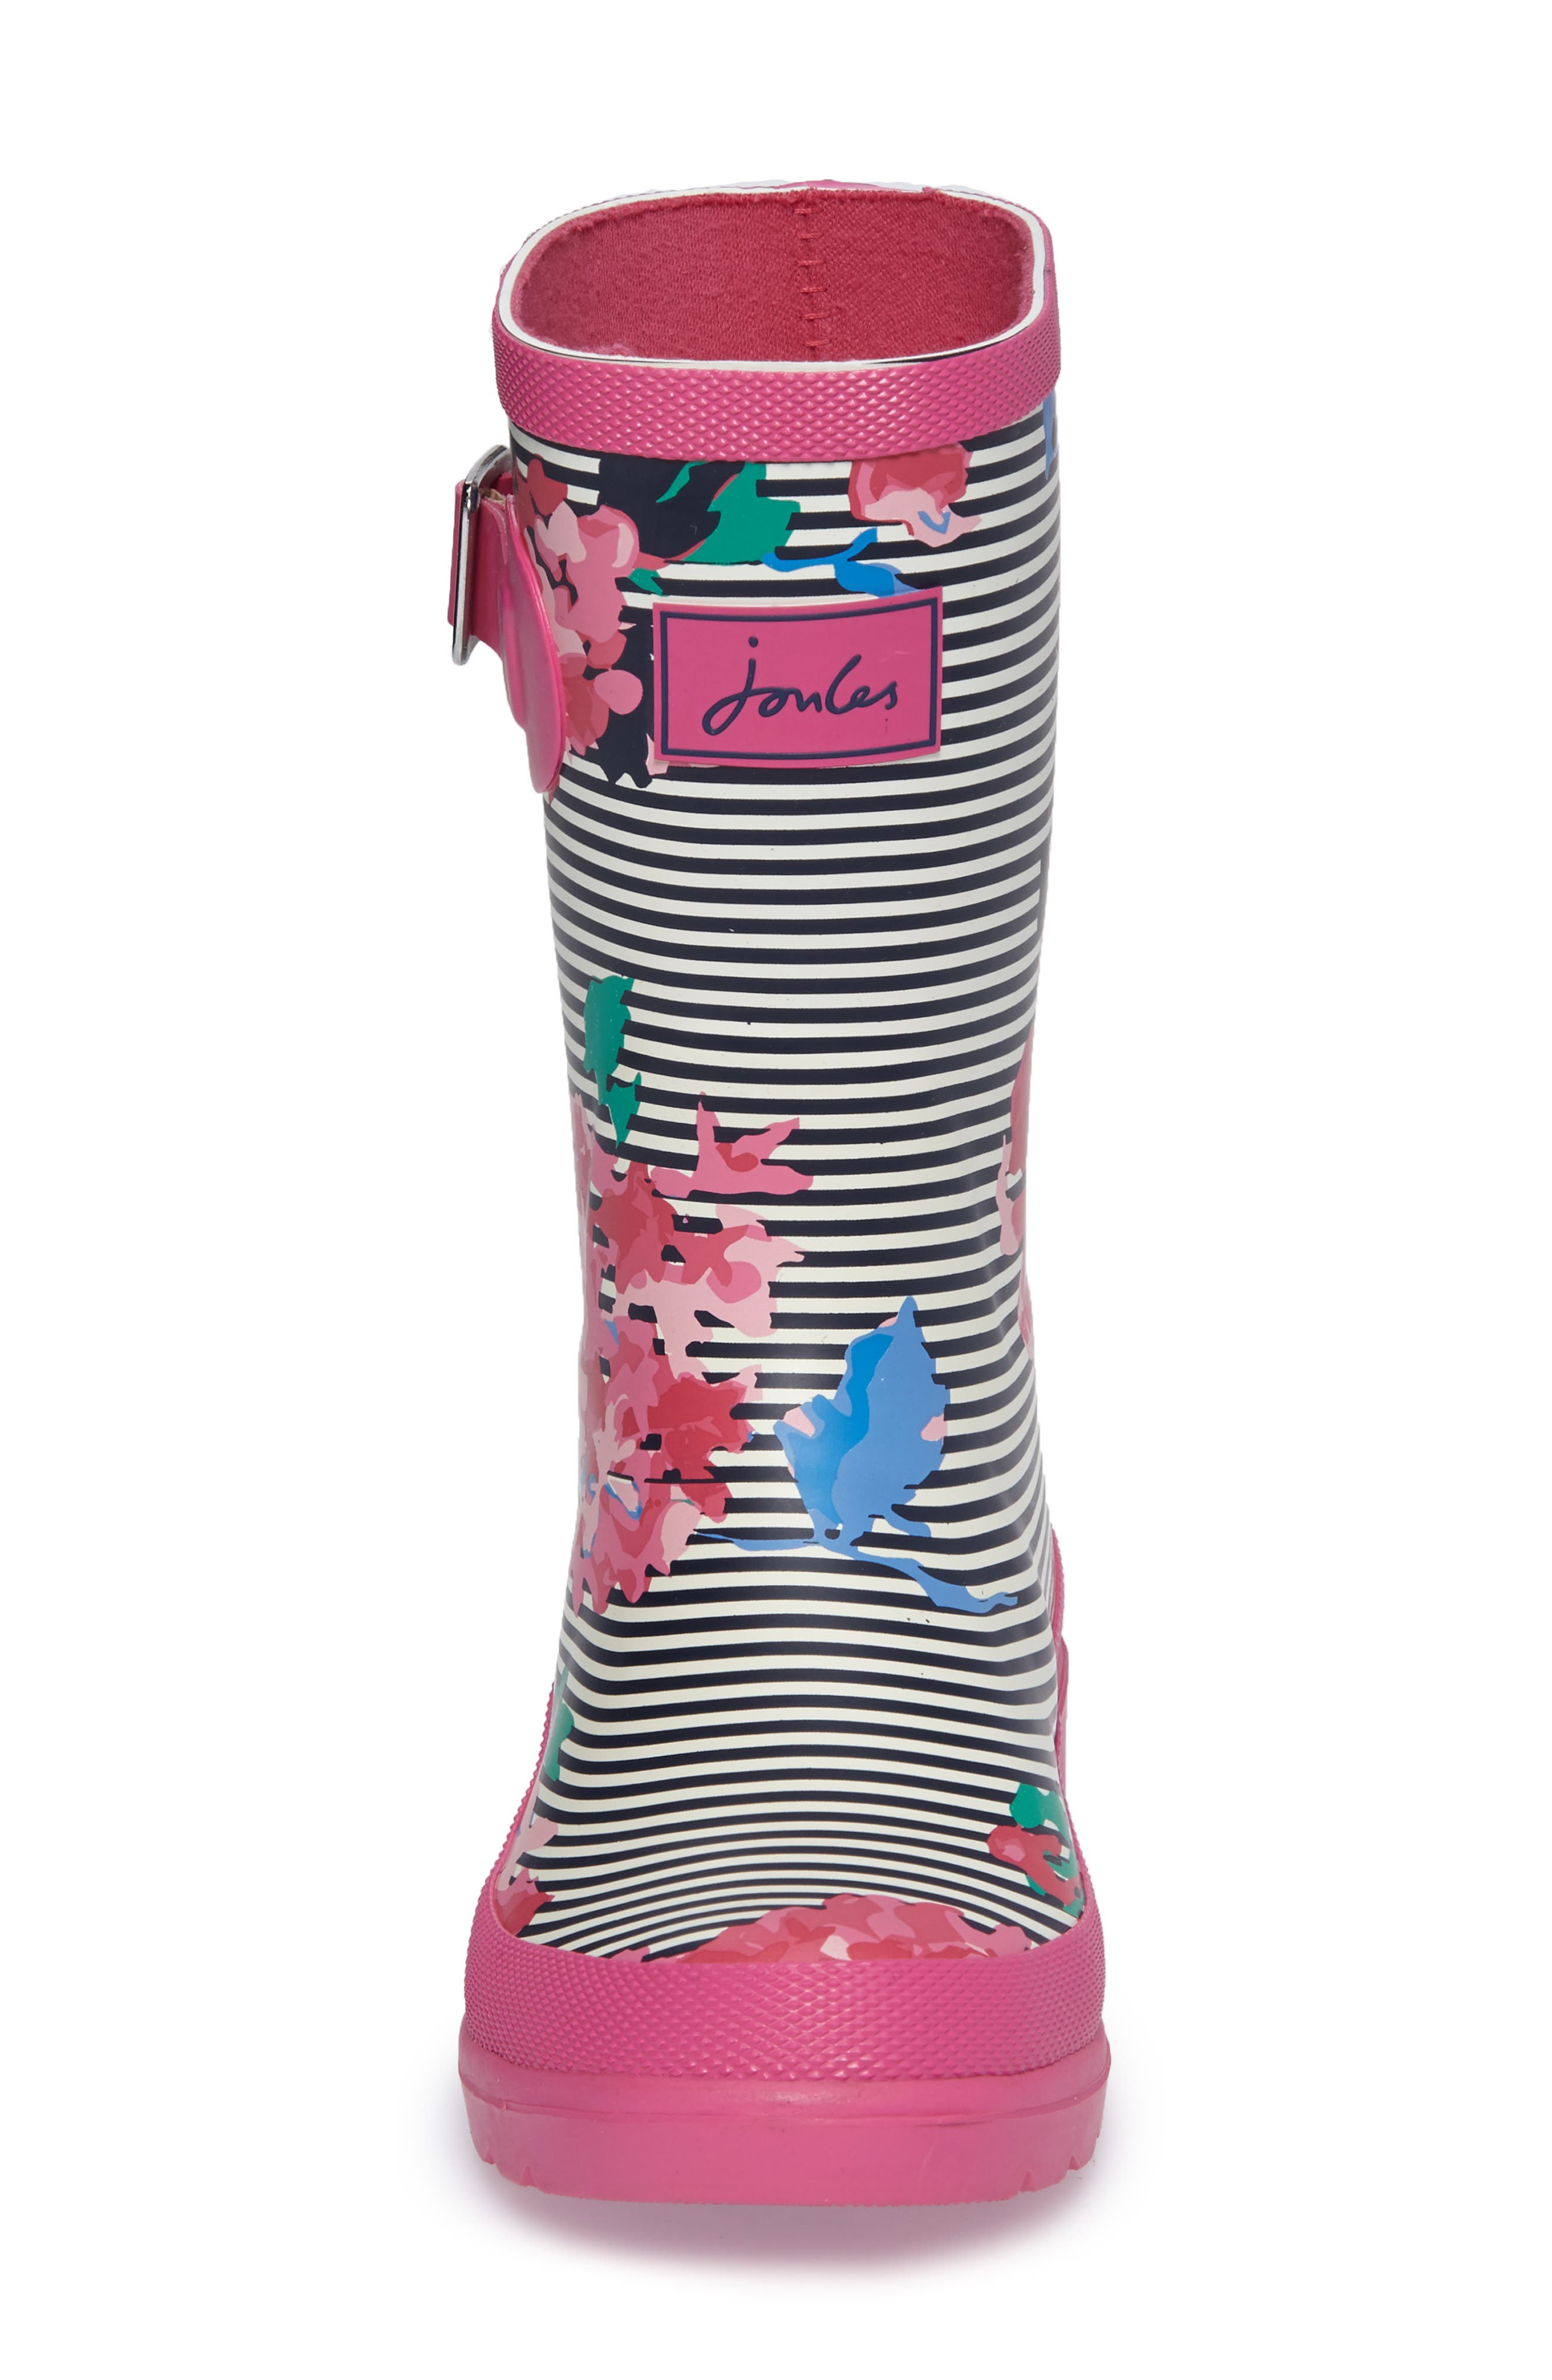 Welly Printed Waterproof Rain Boot,                             Alternate thumbnail 4, color,                             PINK STRIPE FLORAL